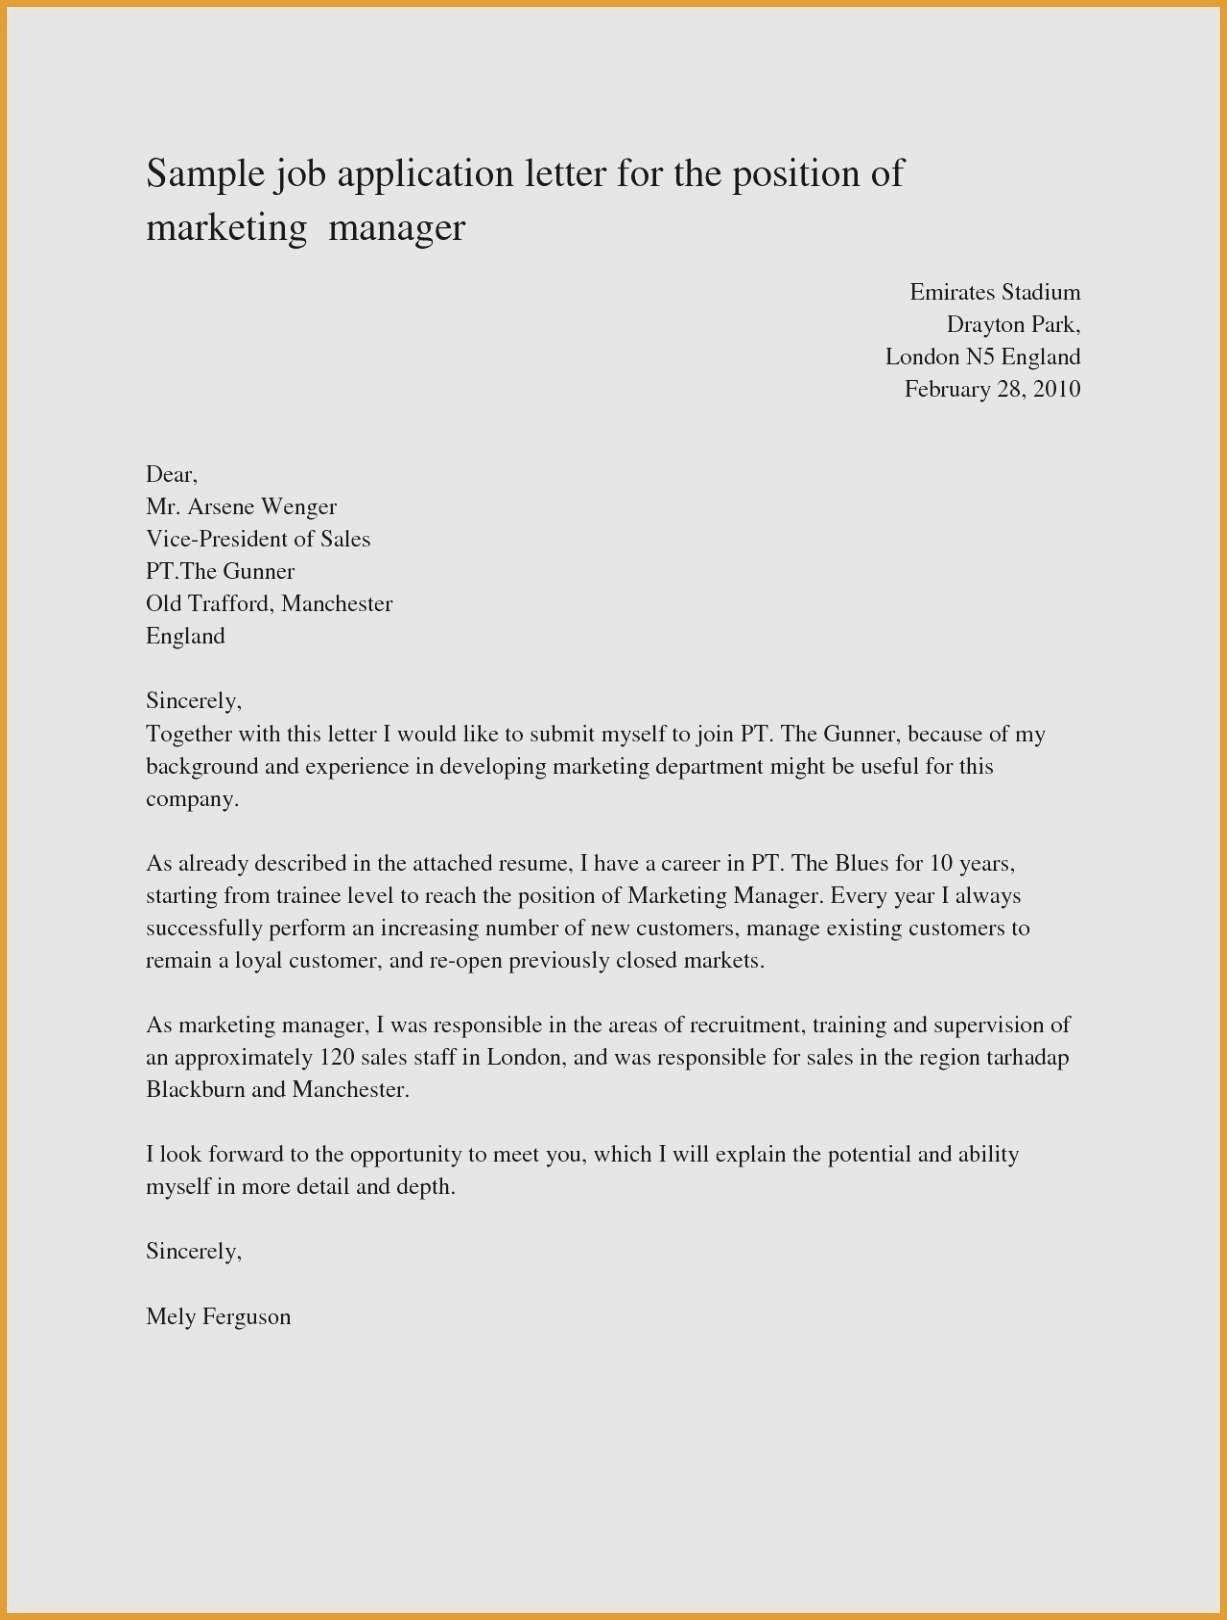 Example Resume Letter For Job Application